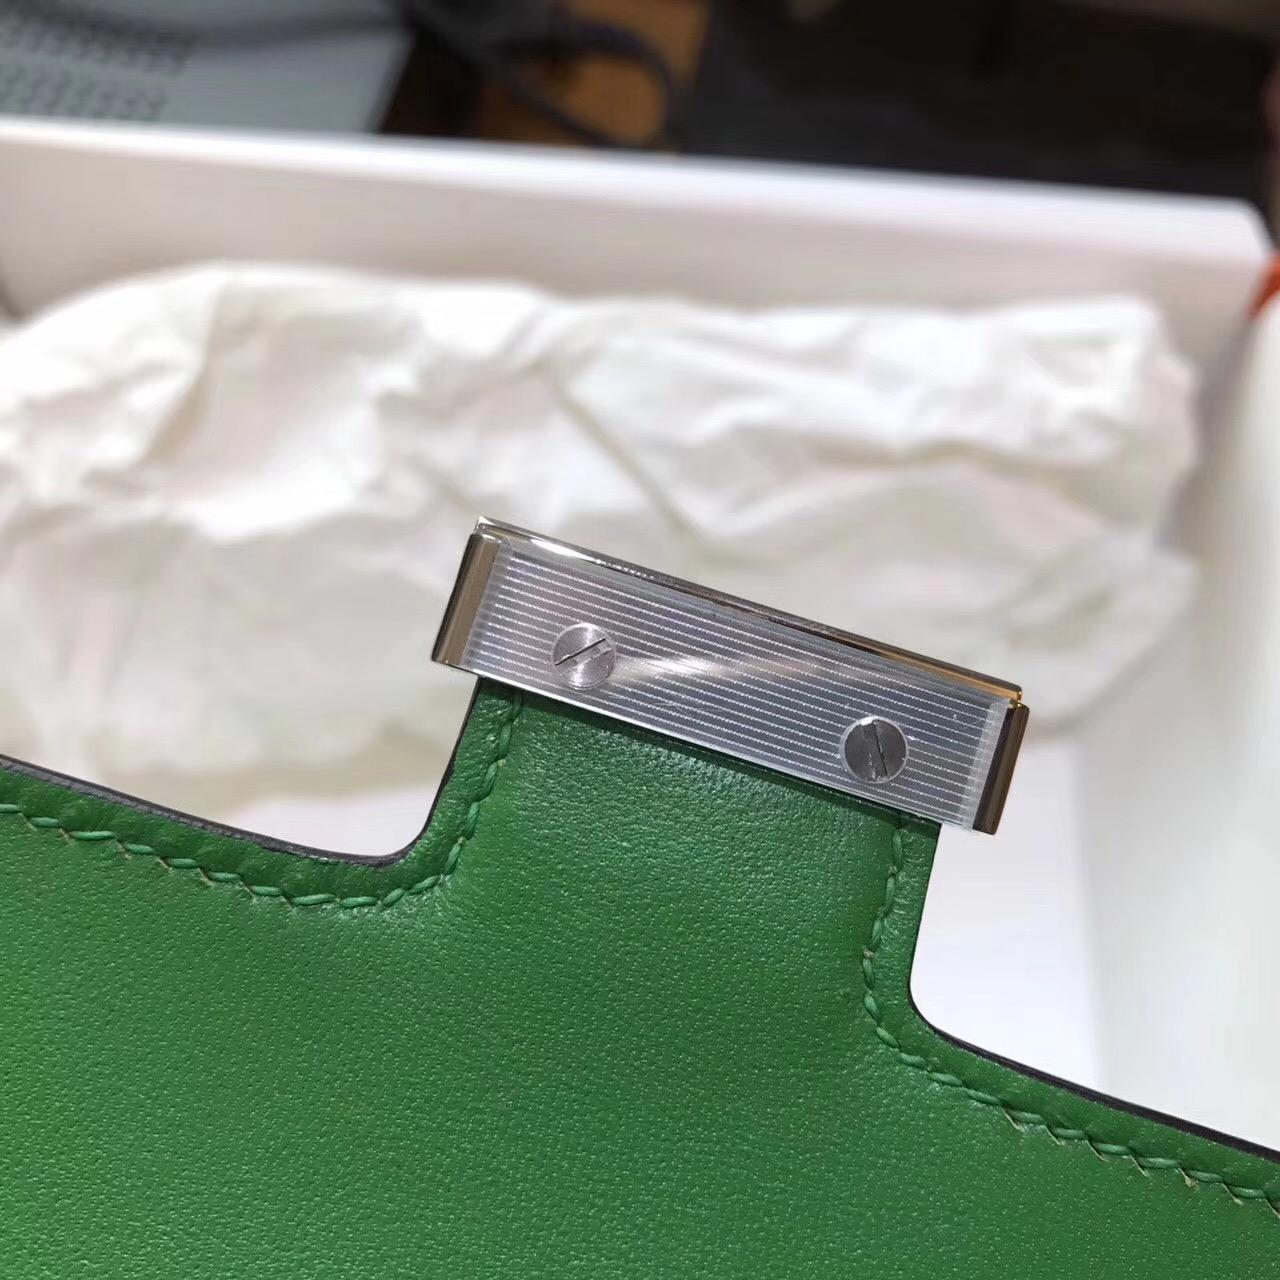 愛馬仕康斯坦斯包 Hermes Constance 18 Epsom 1K竹子绿 银扣